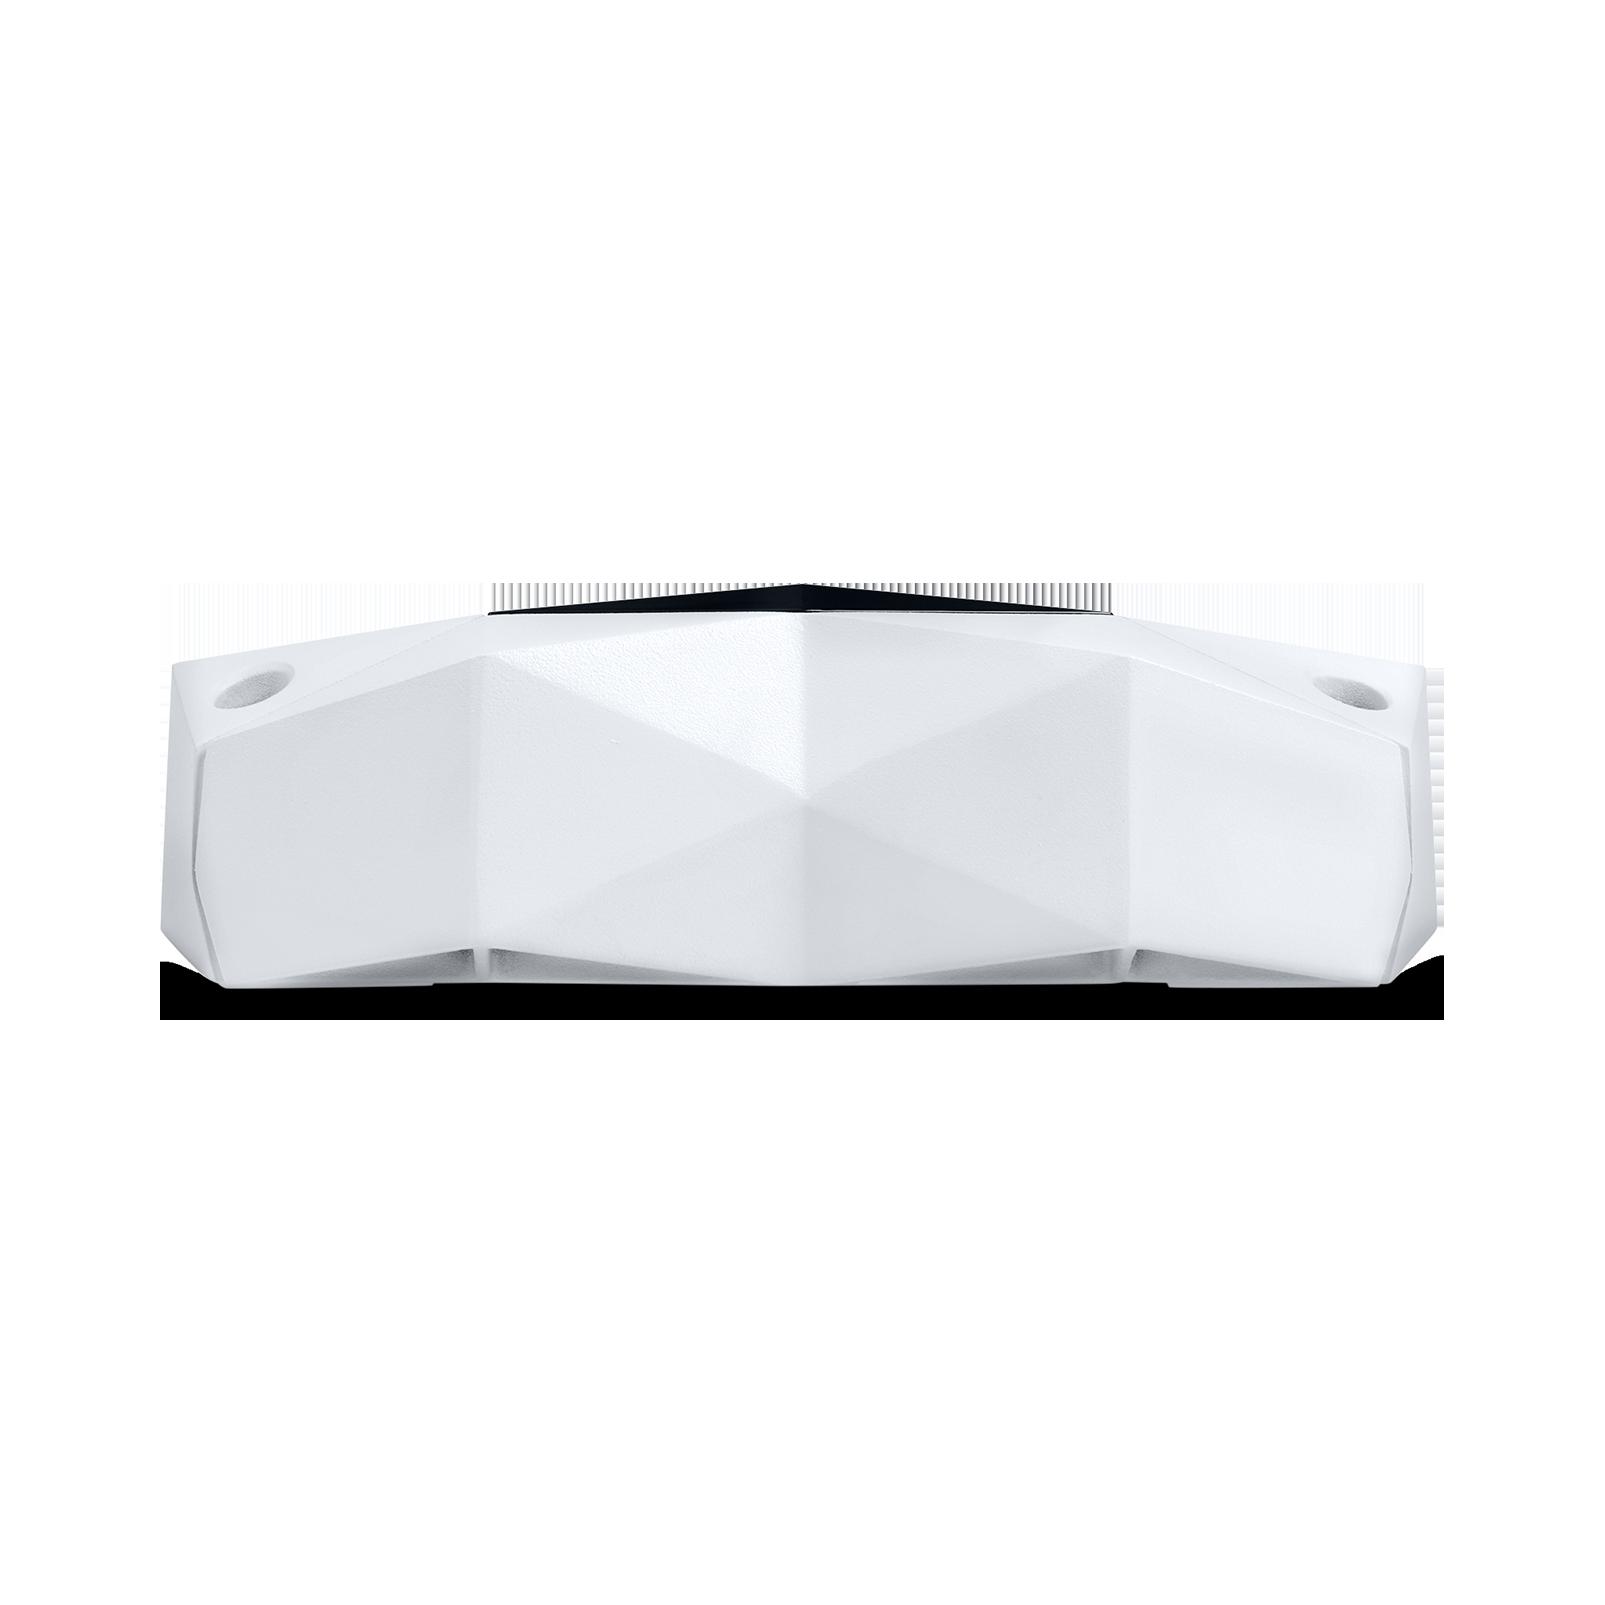 JBL Marine MA4505 - White Matte - Multi-element high-performance, 5-channel amplifier - Detailshot 3